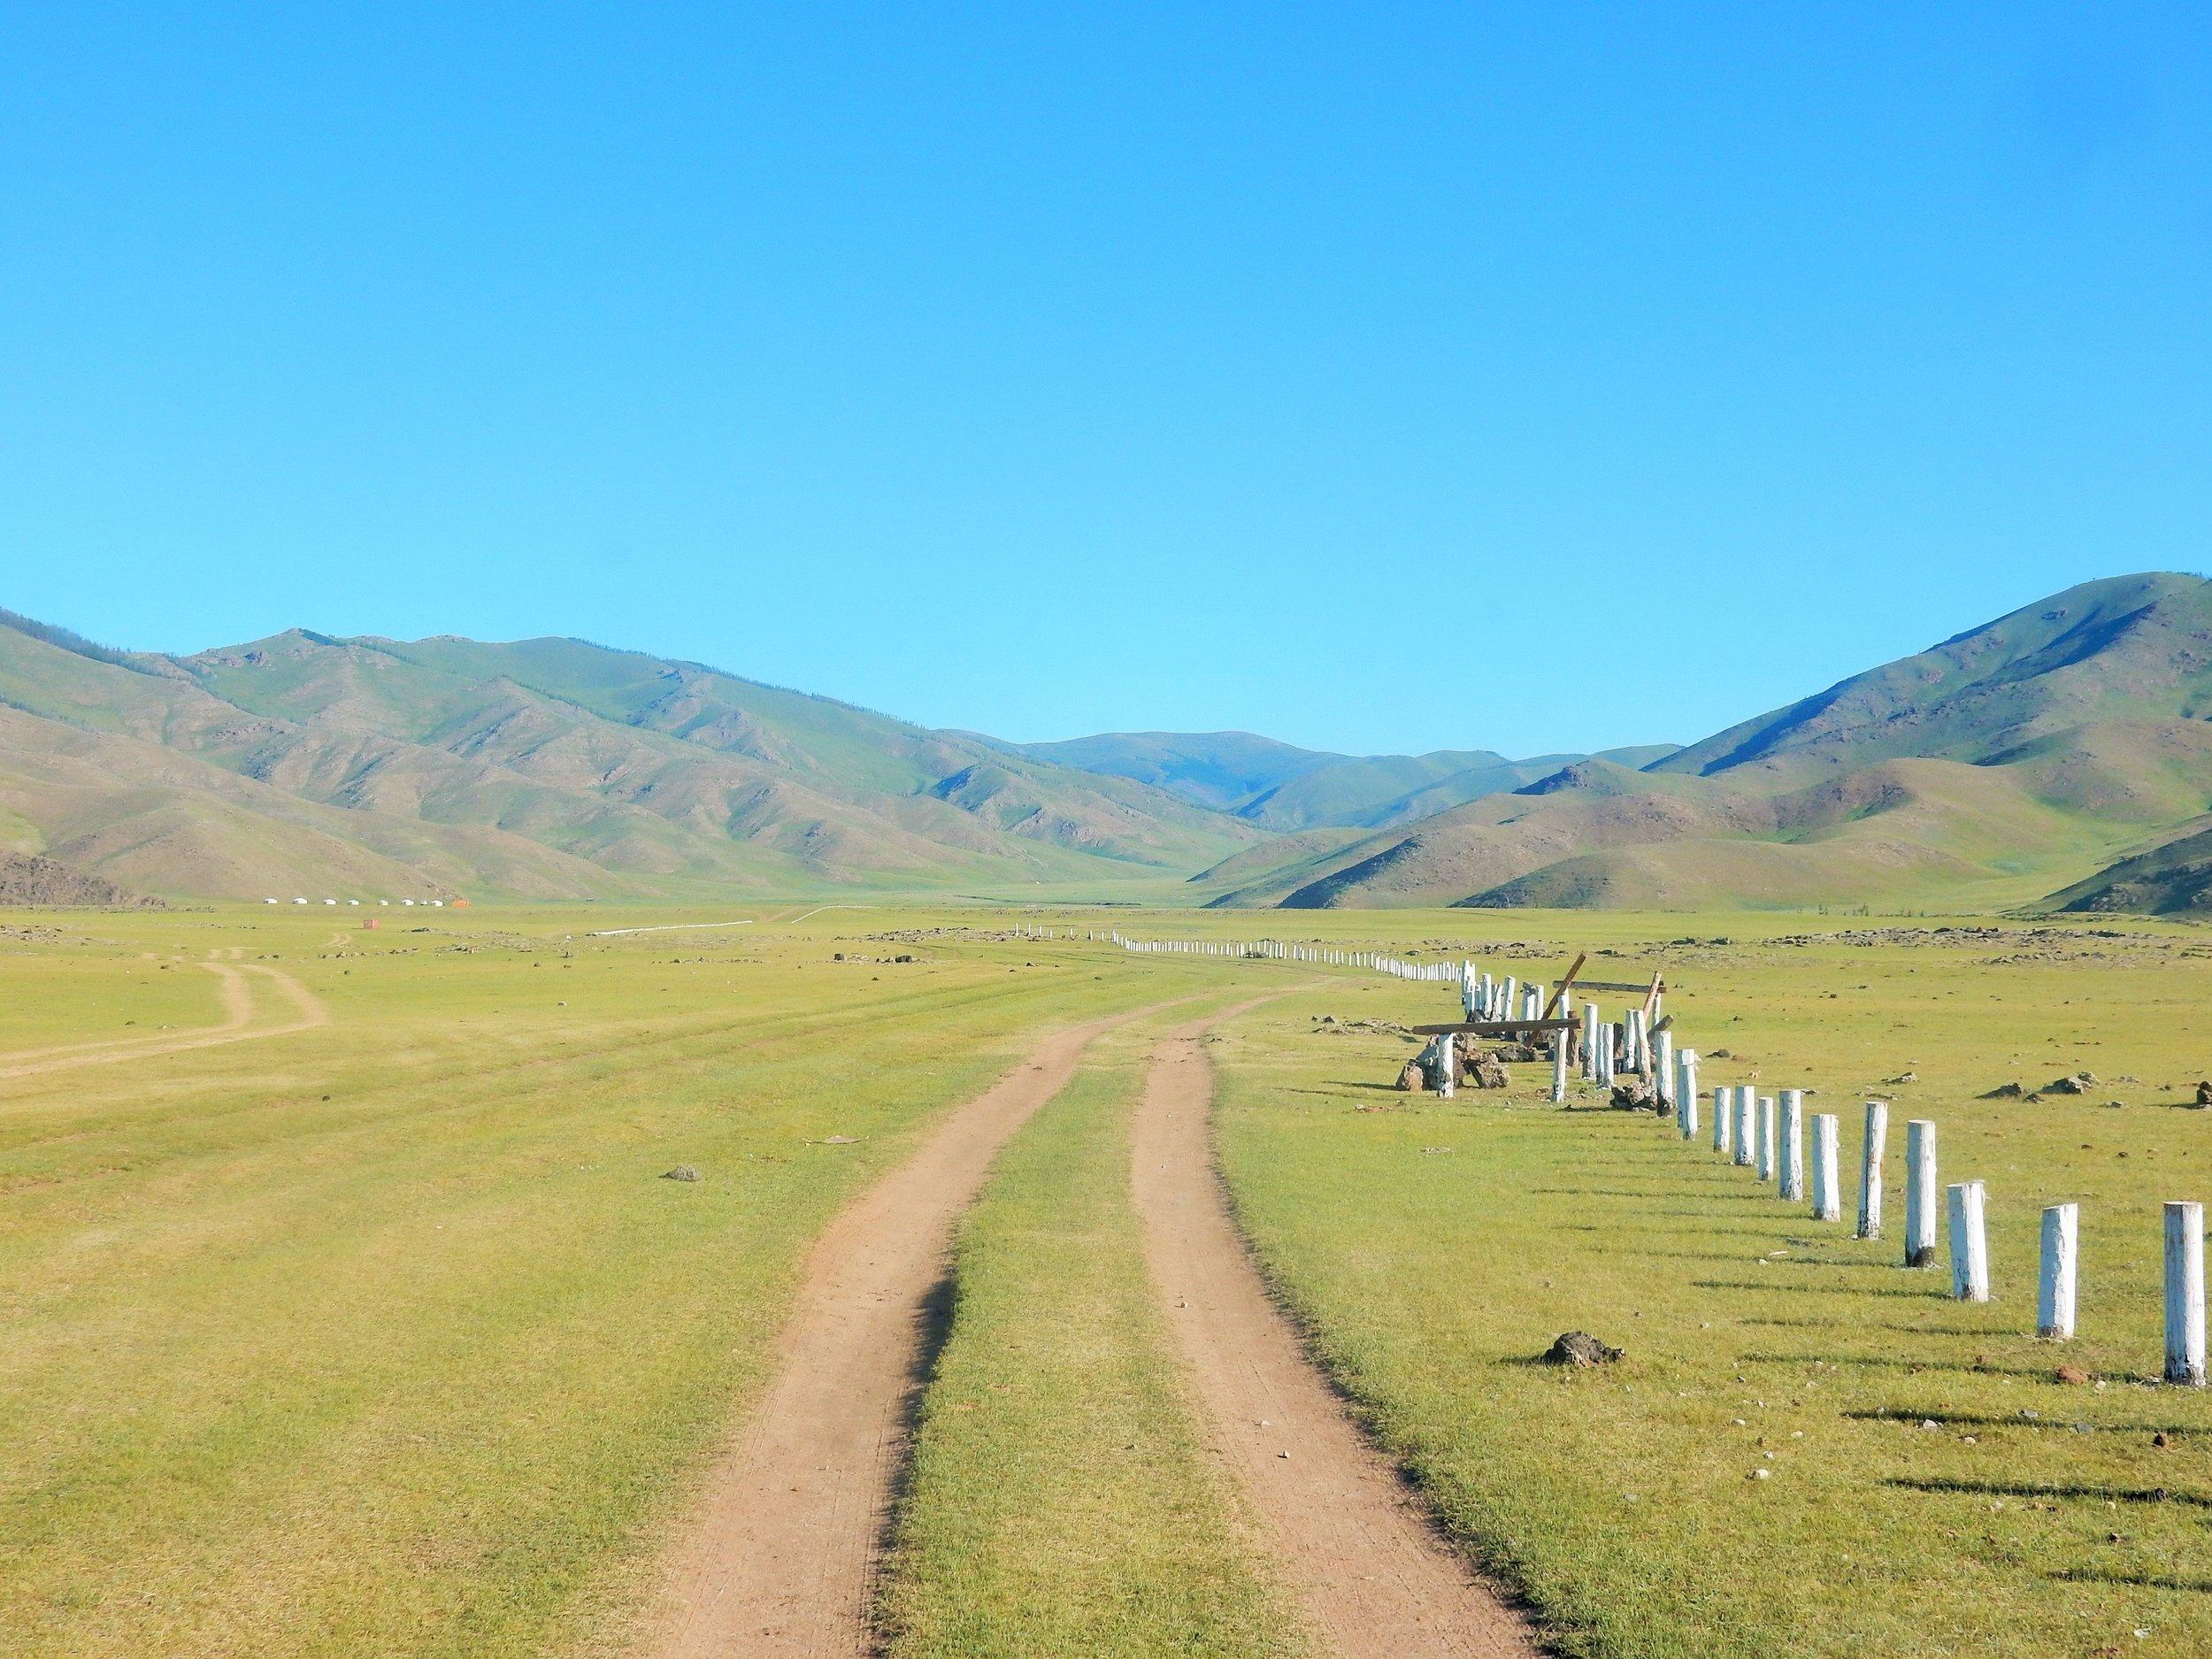 sejour-mongolie-stage-retraite-chamane.jpg